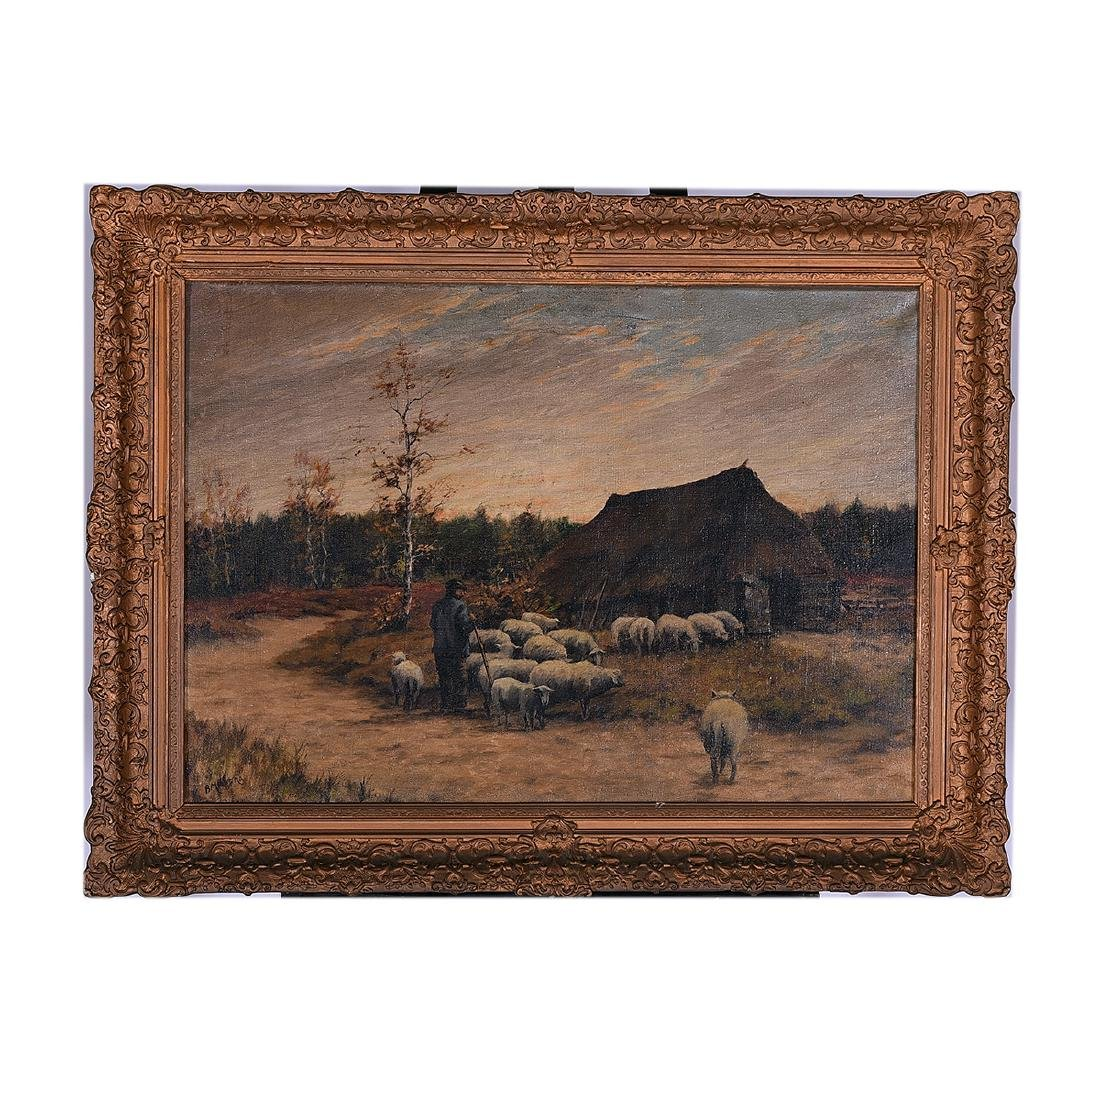 "B. Medema ""Tending the Flock"" oil on canvas - 4"